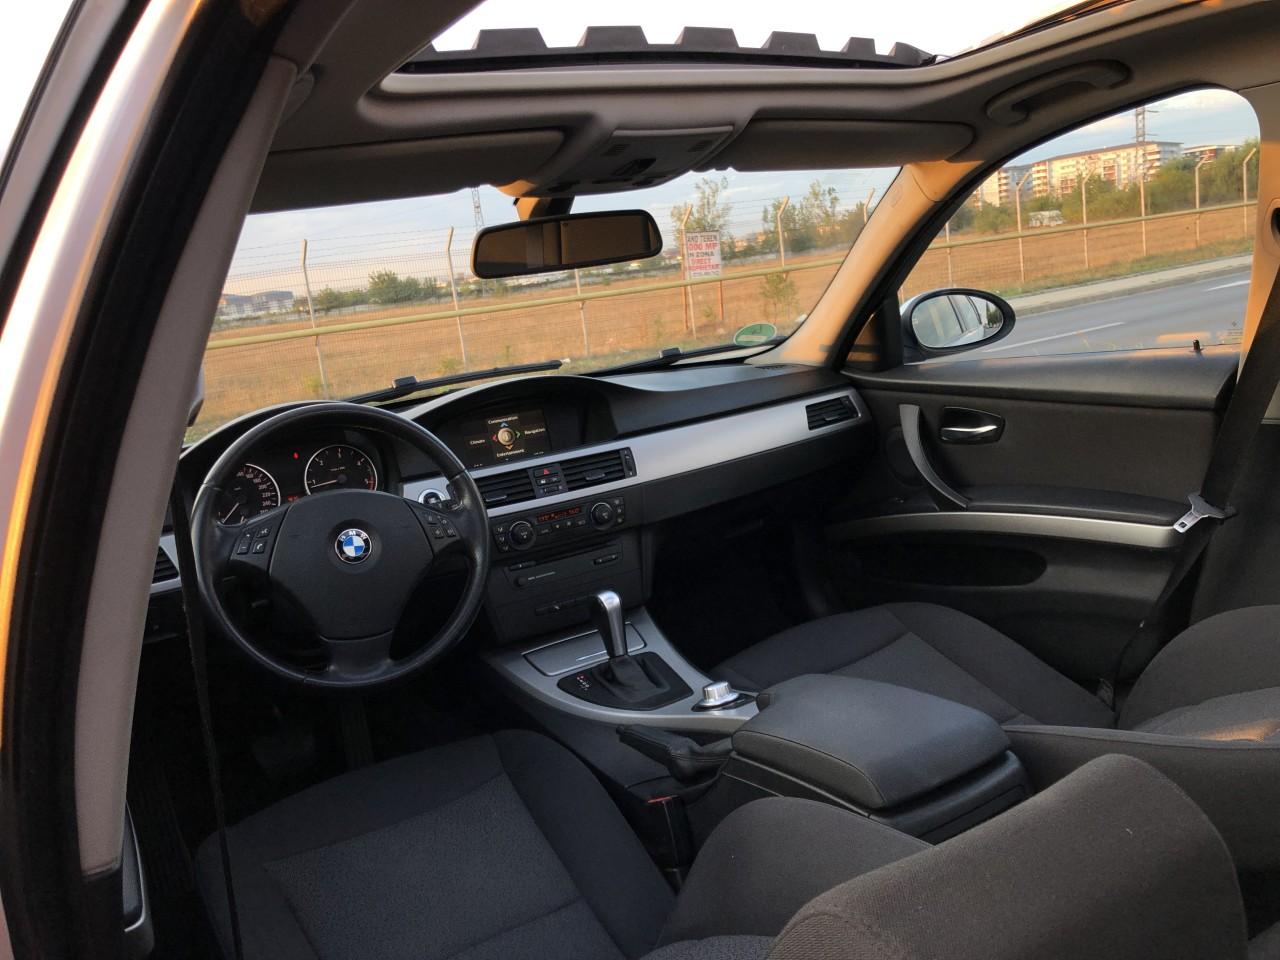 BMW 320 BMW 320d 163Cp/Automata /Navi/Trapa/Senzori parcare fata+spate/RECENT ADUSA DIN GERMANIA!!! 2006